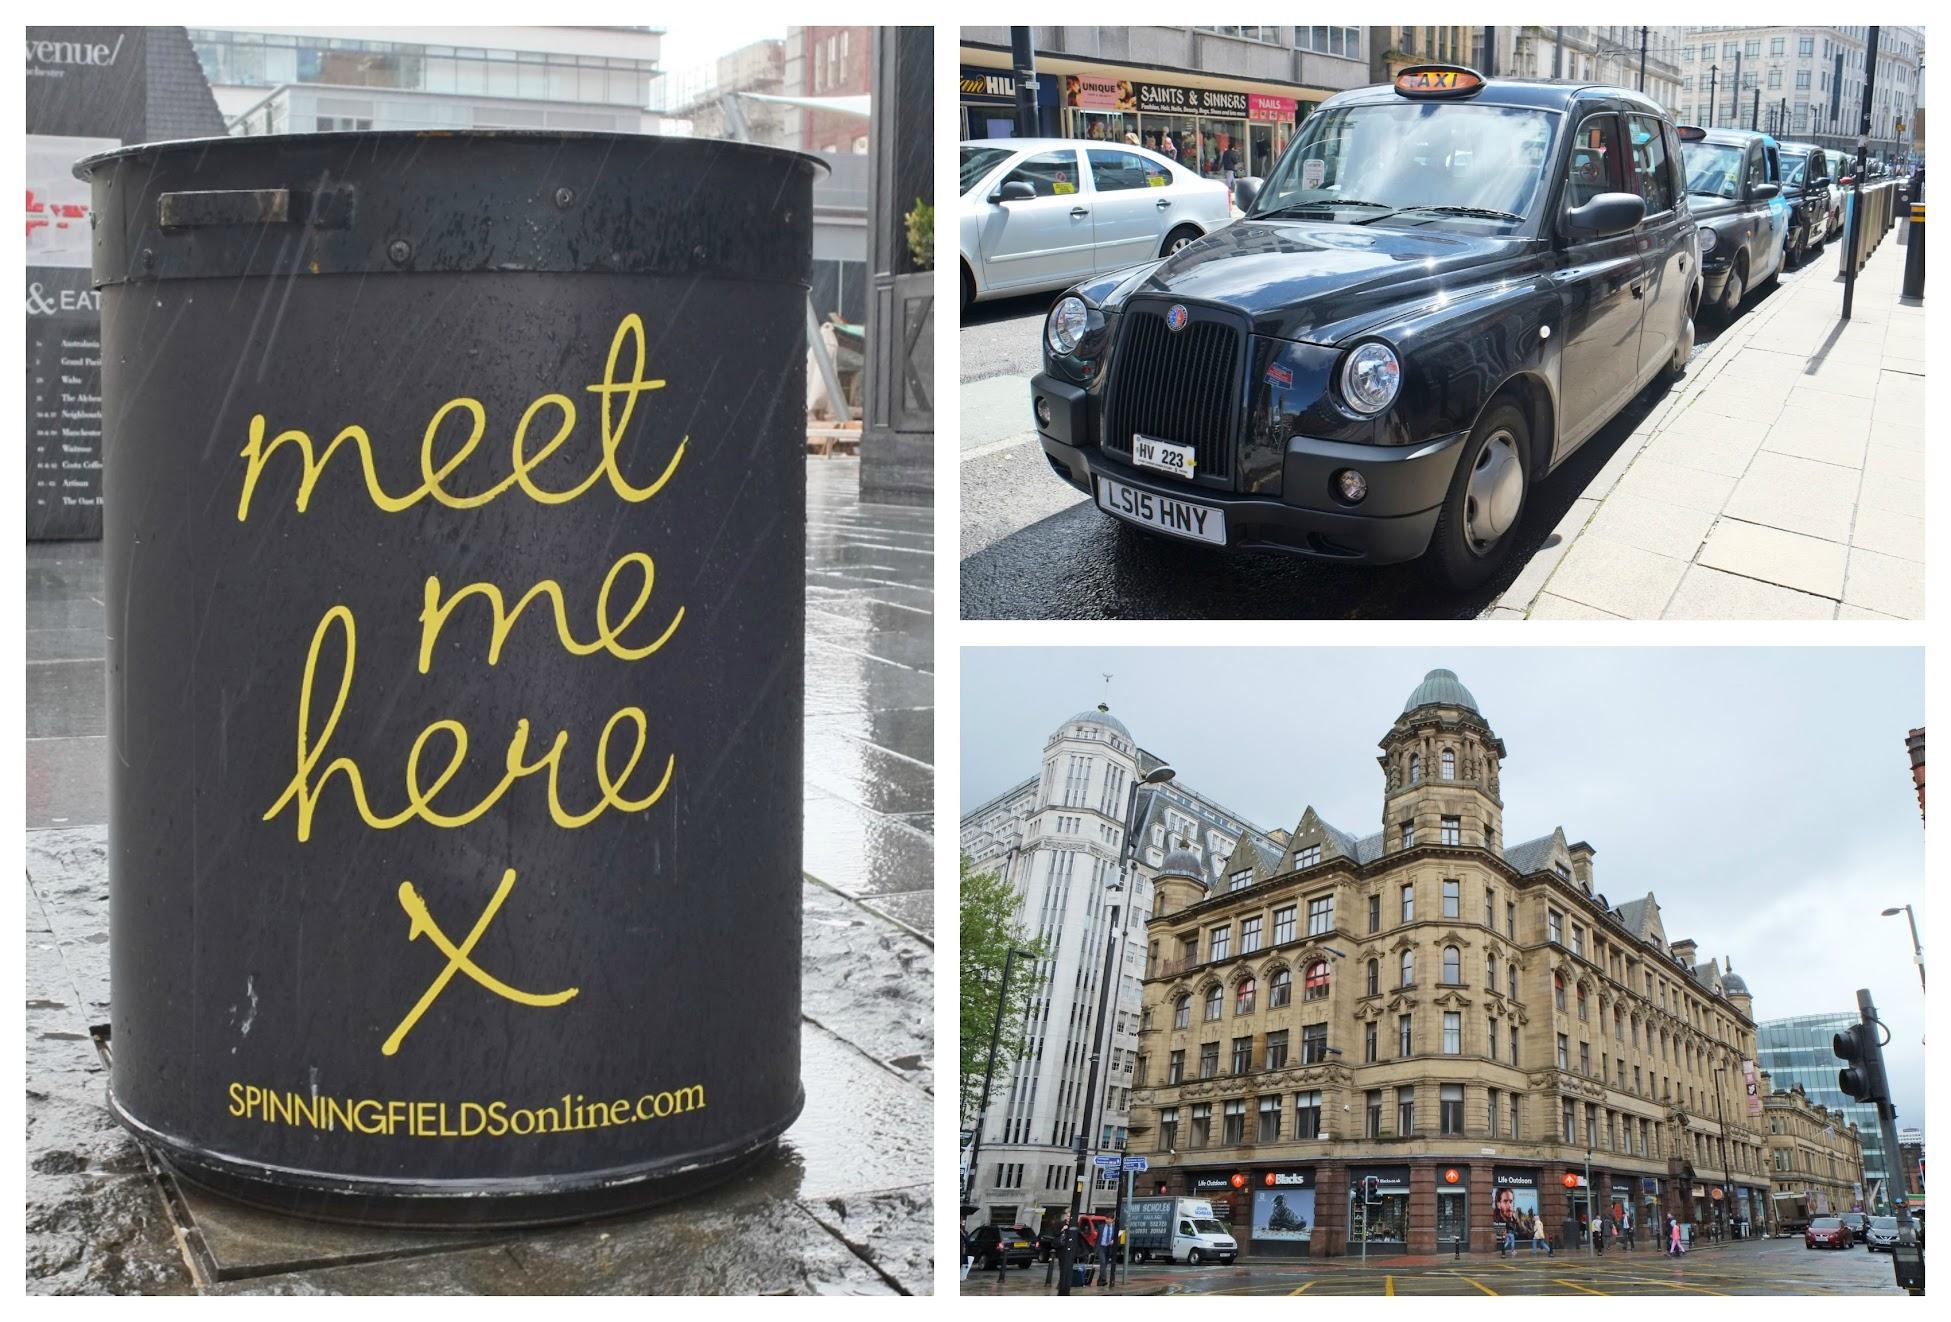 Explore Manchester